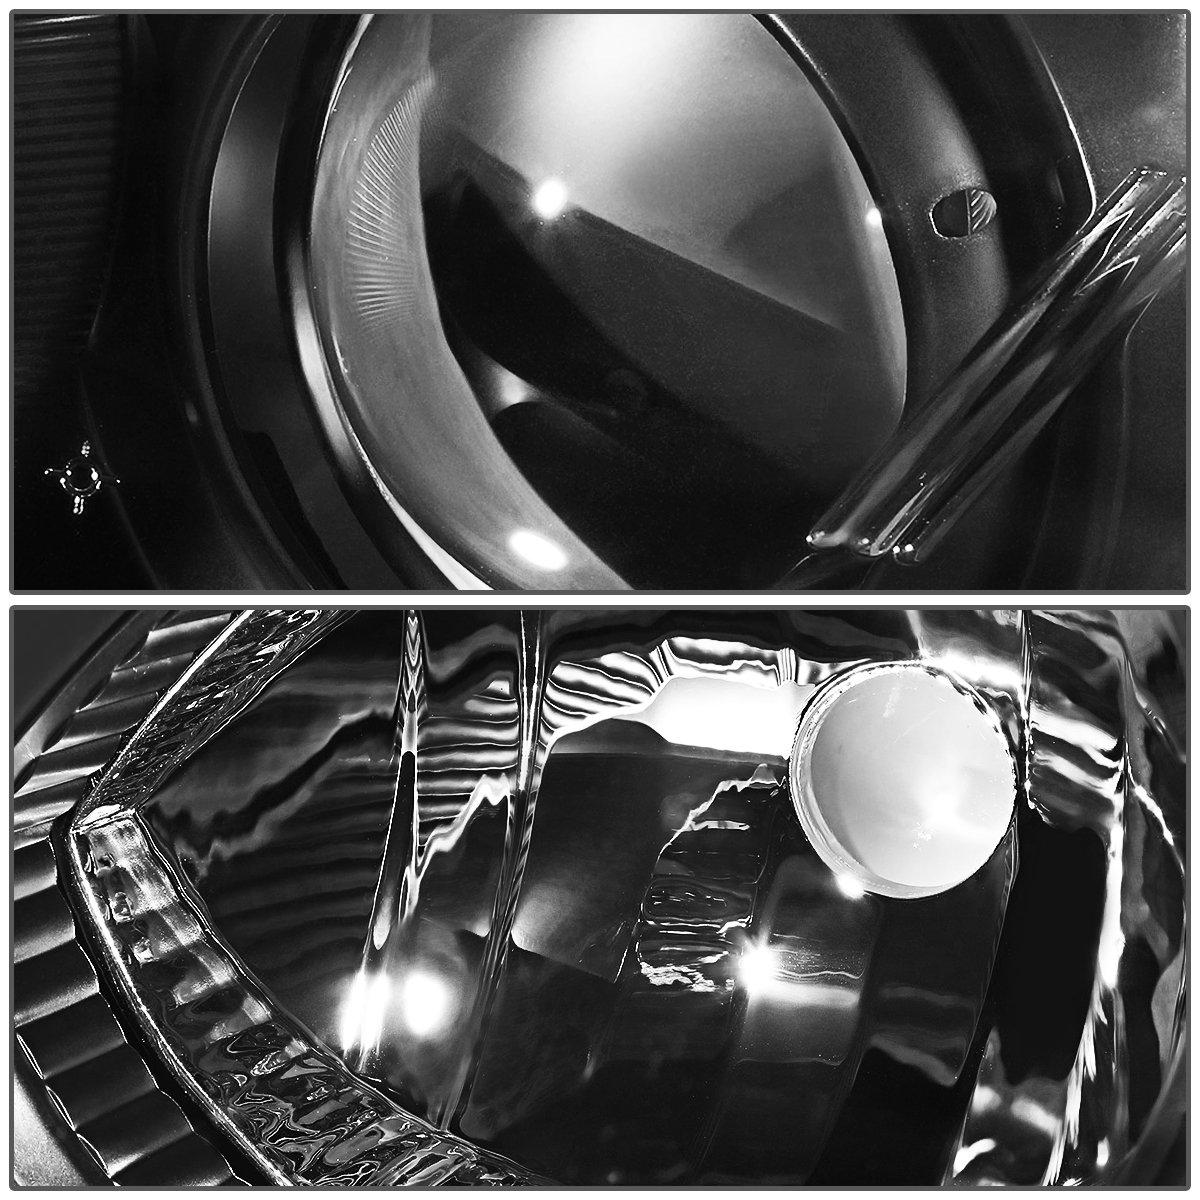 DNA Motoring HL-OH-MM304-BK-AM Headlight Driver /& Passenger Side